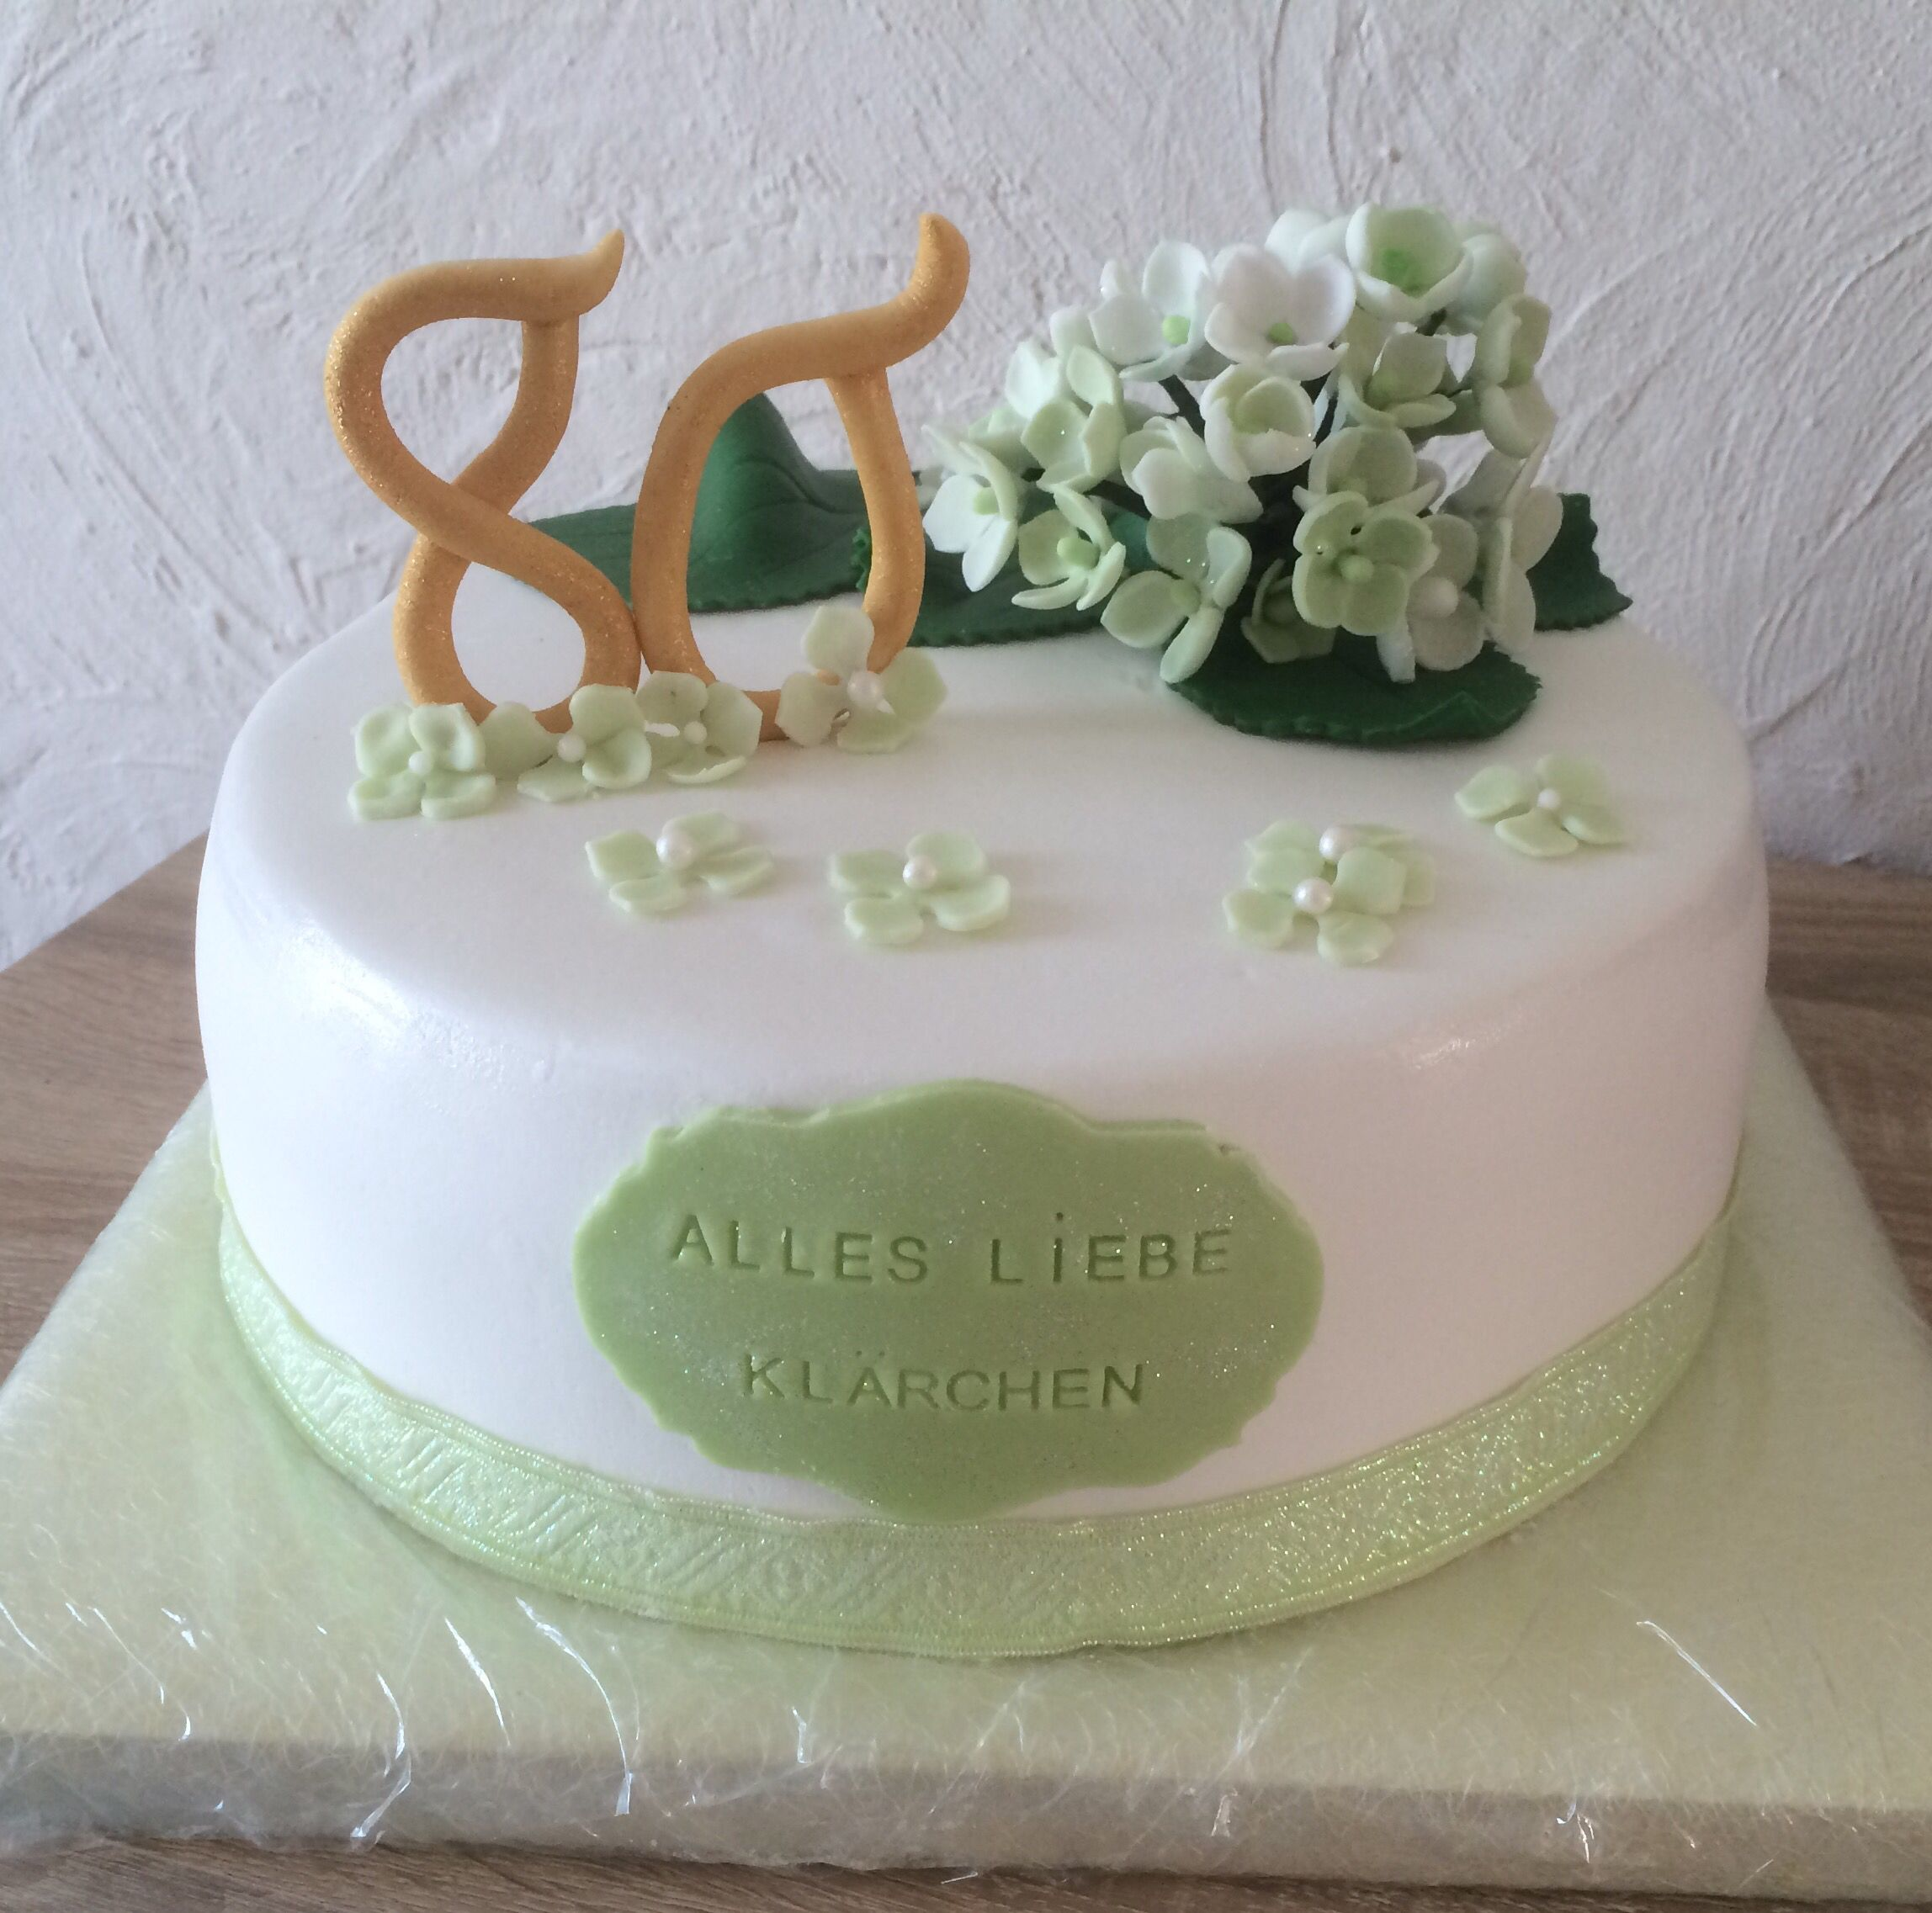 Fondant Torte Motivtorte Hortensien Grun Blumen 80 Geburtstag Cake Hortensia Hydrogena Birthday Geburtstag Torte Fondant Torten Motivtorte